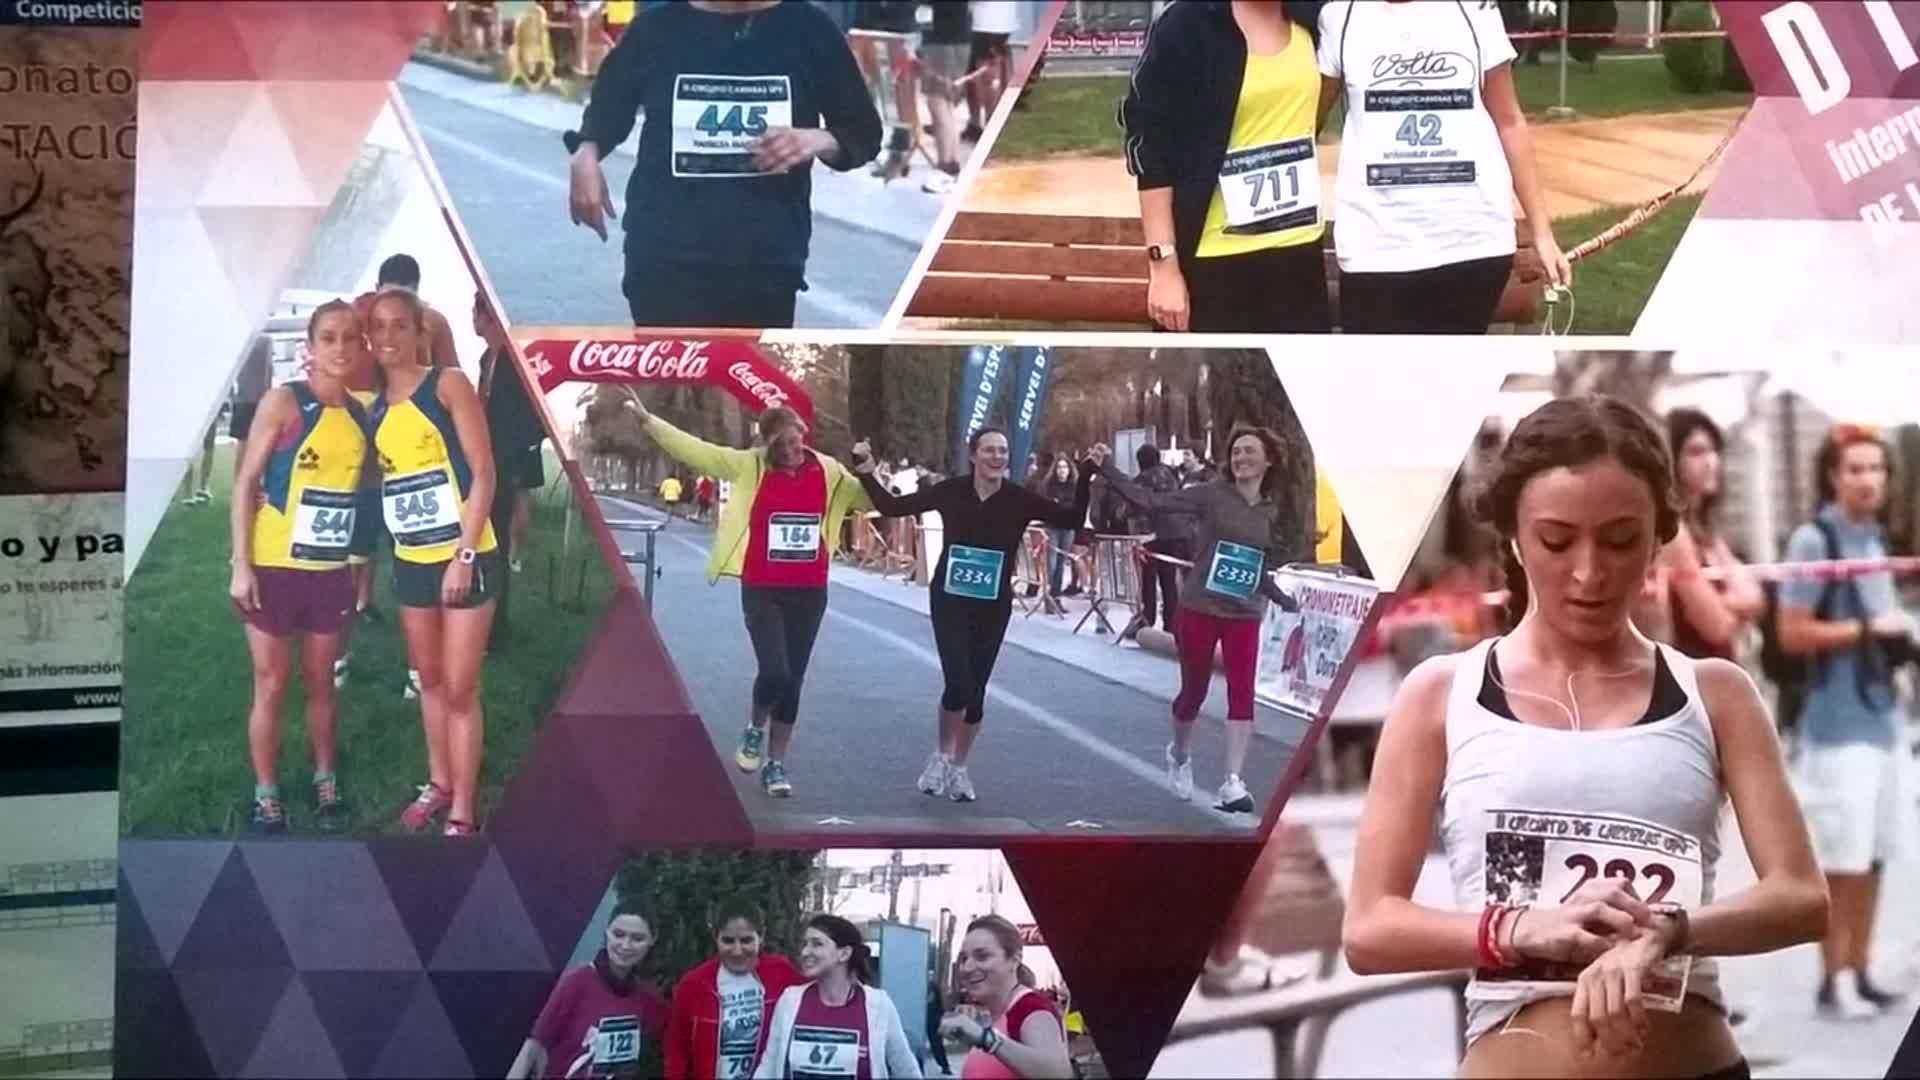 08-03-2016 Mujer y deporte en la UPV